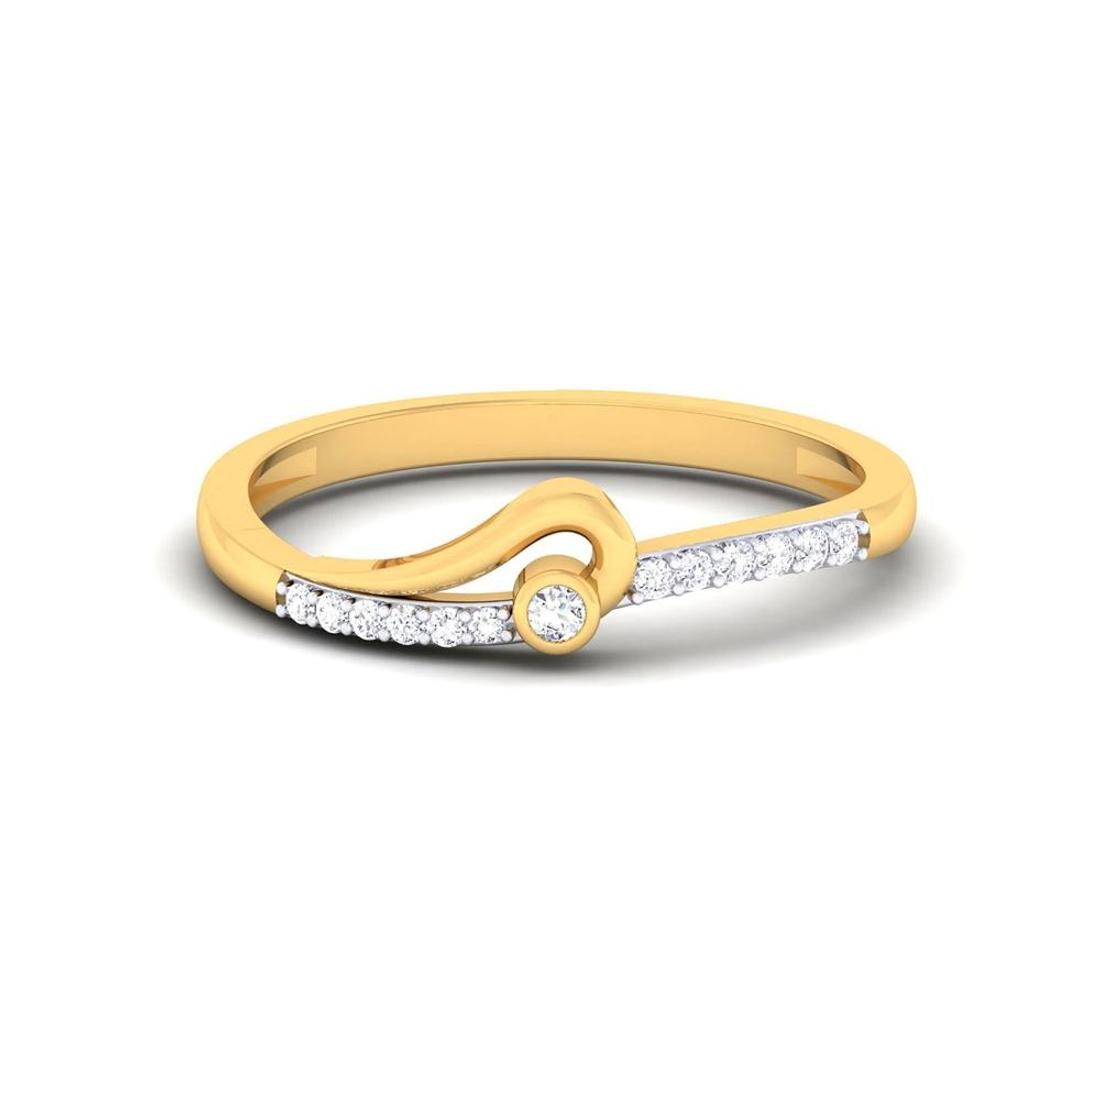 Buy Charu Jewels Diamond Ladies Ring CJLR0831 Online in India